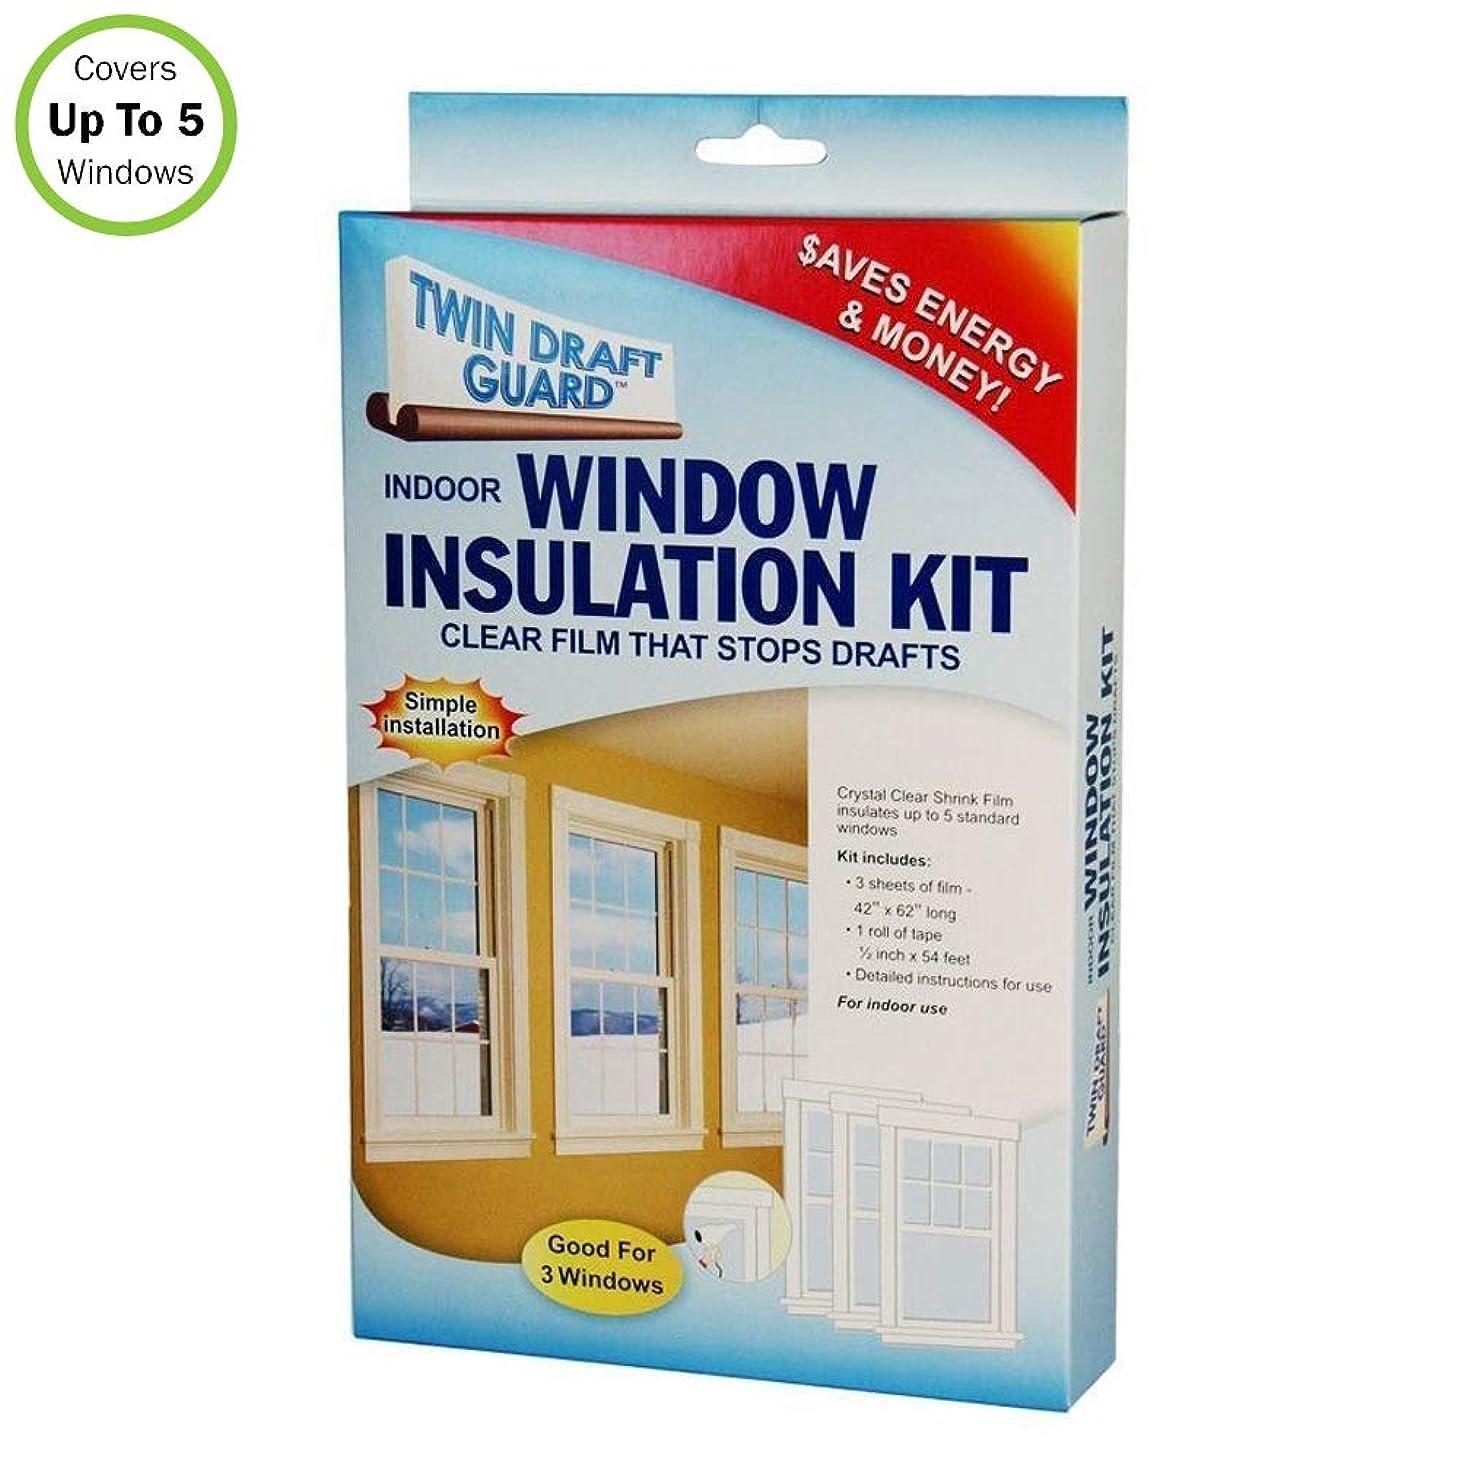 Twin Draft Guard 3 Window Insulation Kit Energy Saver Heat/Cooling Efficiency